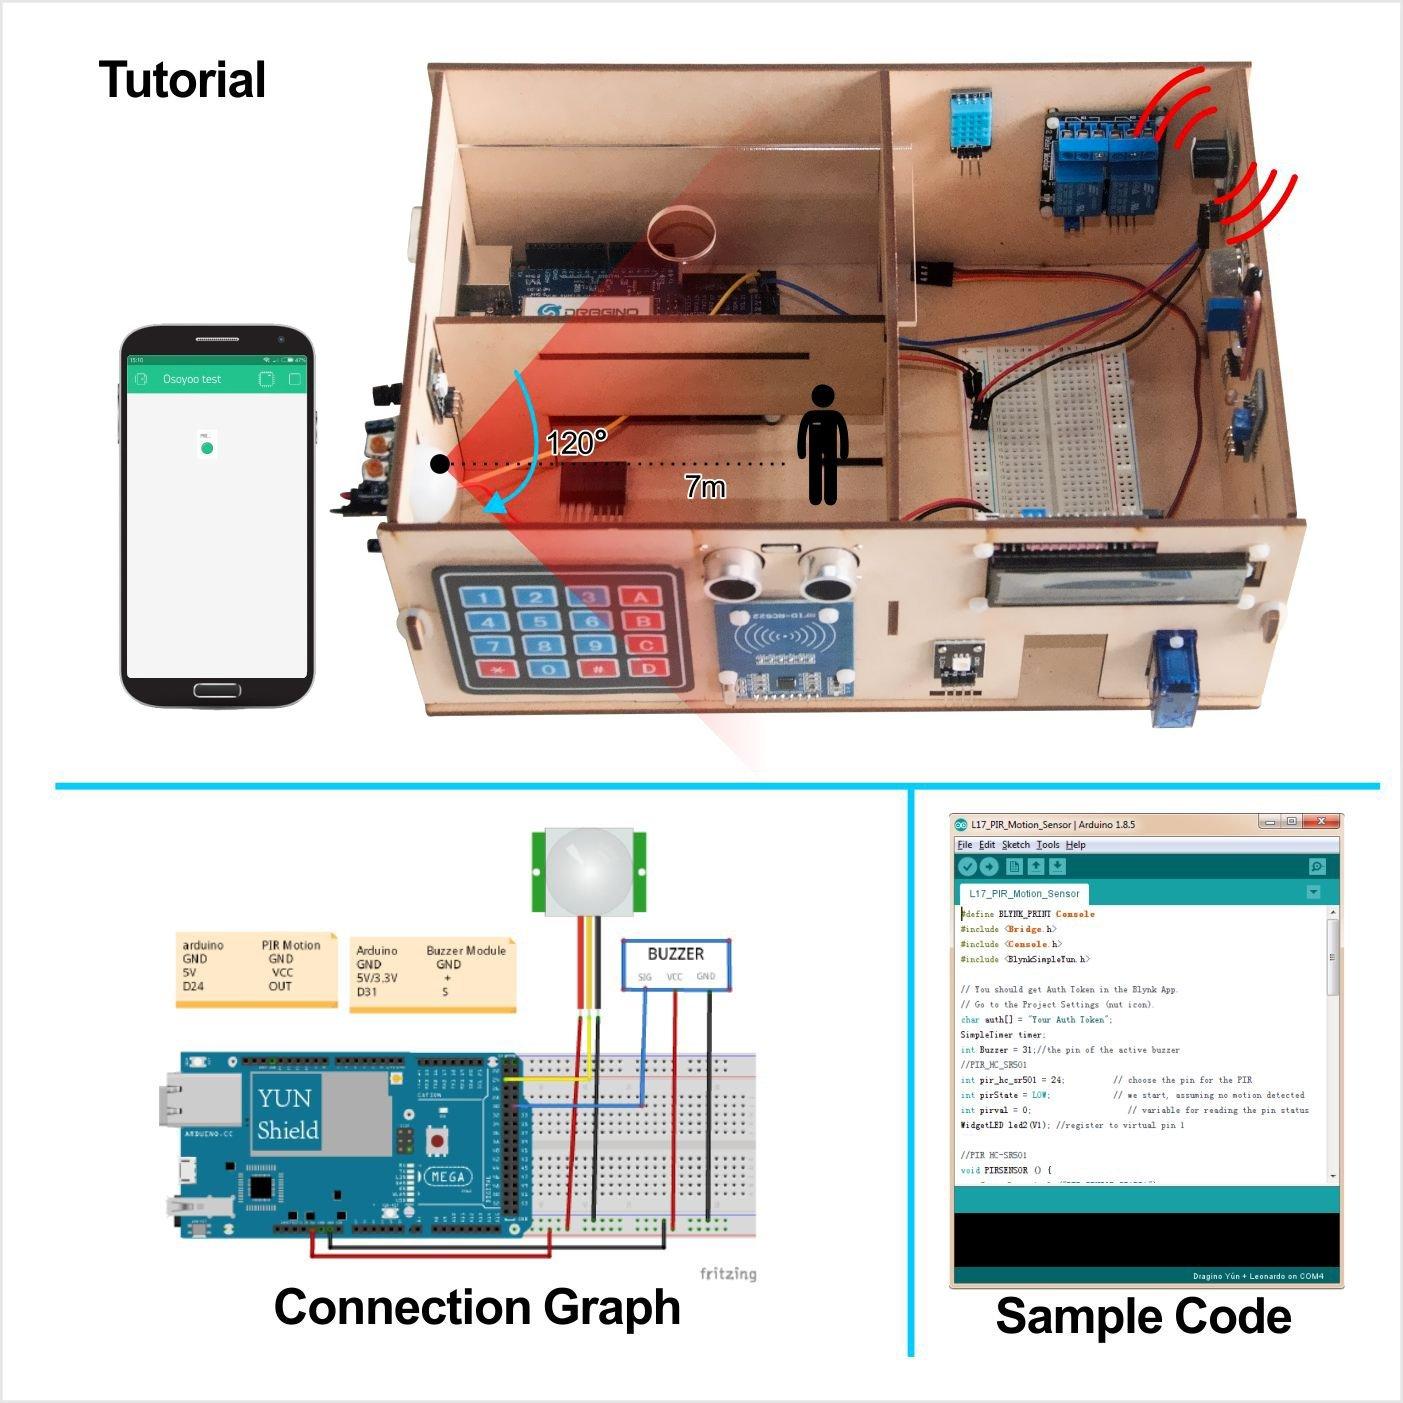 Osoyoo Yun Iot Smart Home Electronic Kit For Arduino Mega Board And Leonardo Pinout Diagrams Adafruit Industries Wooden House Model Diy Project Gewerbe Industrie Wissenschaft